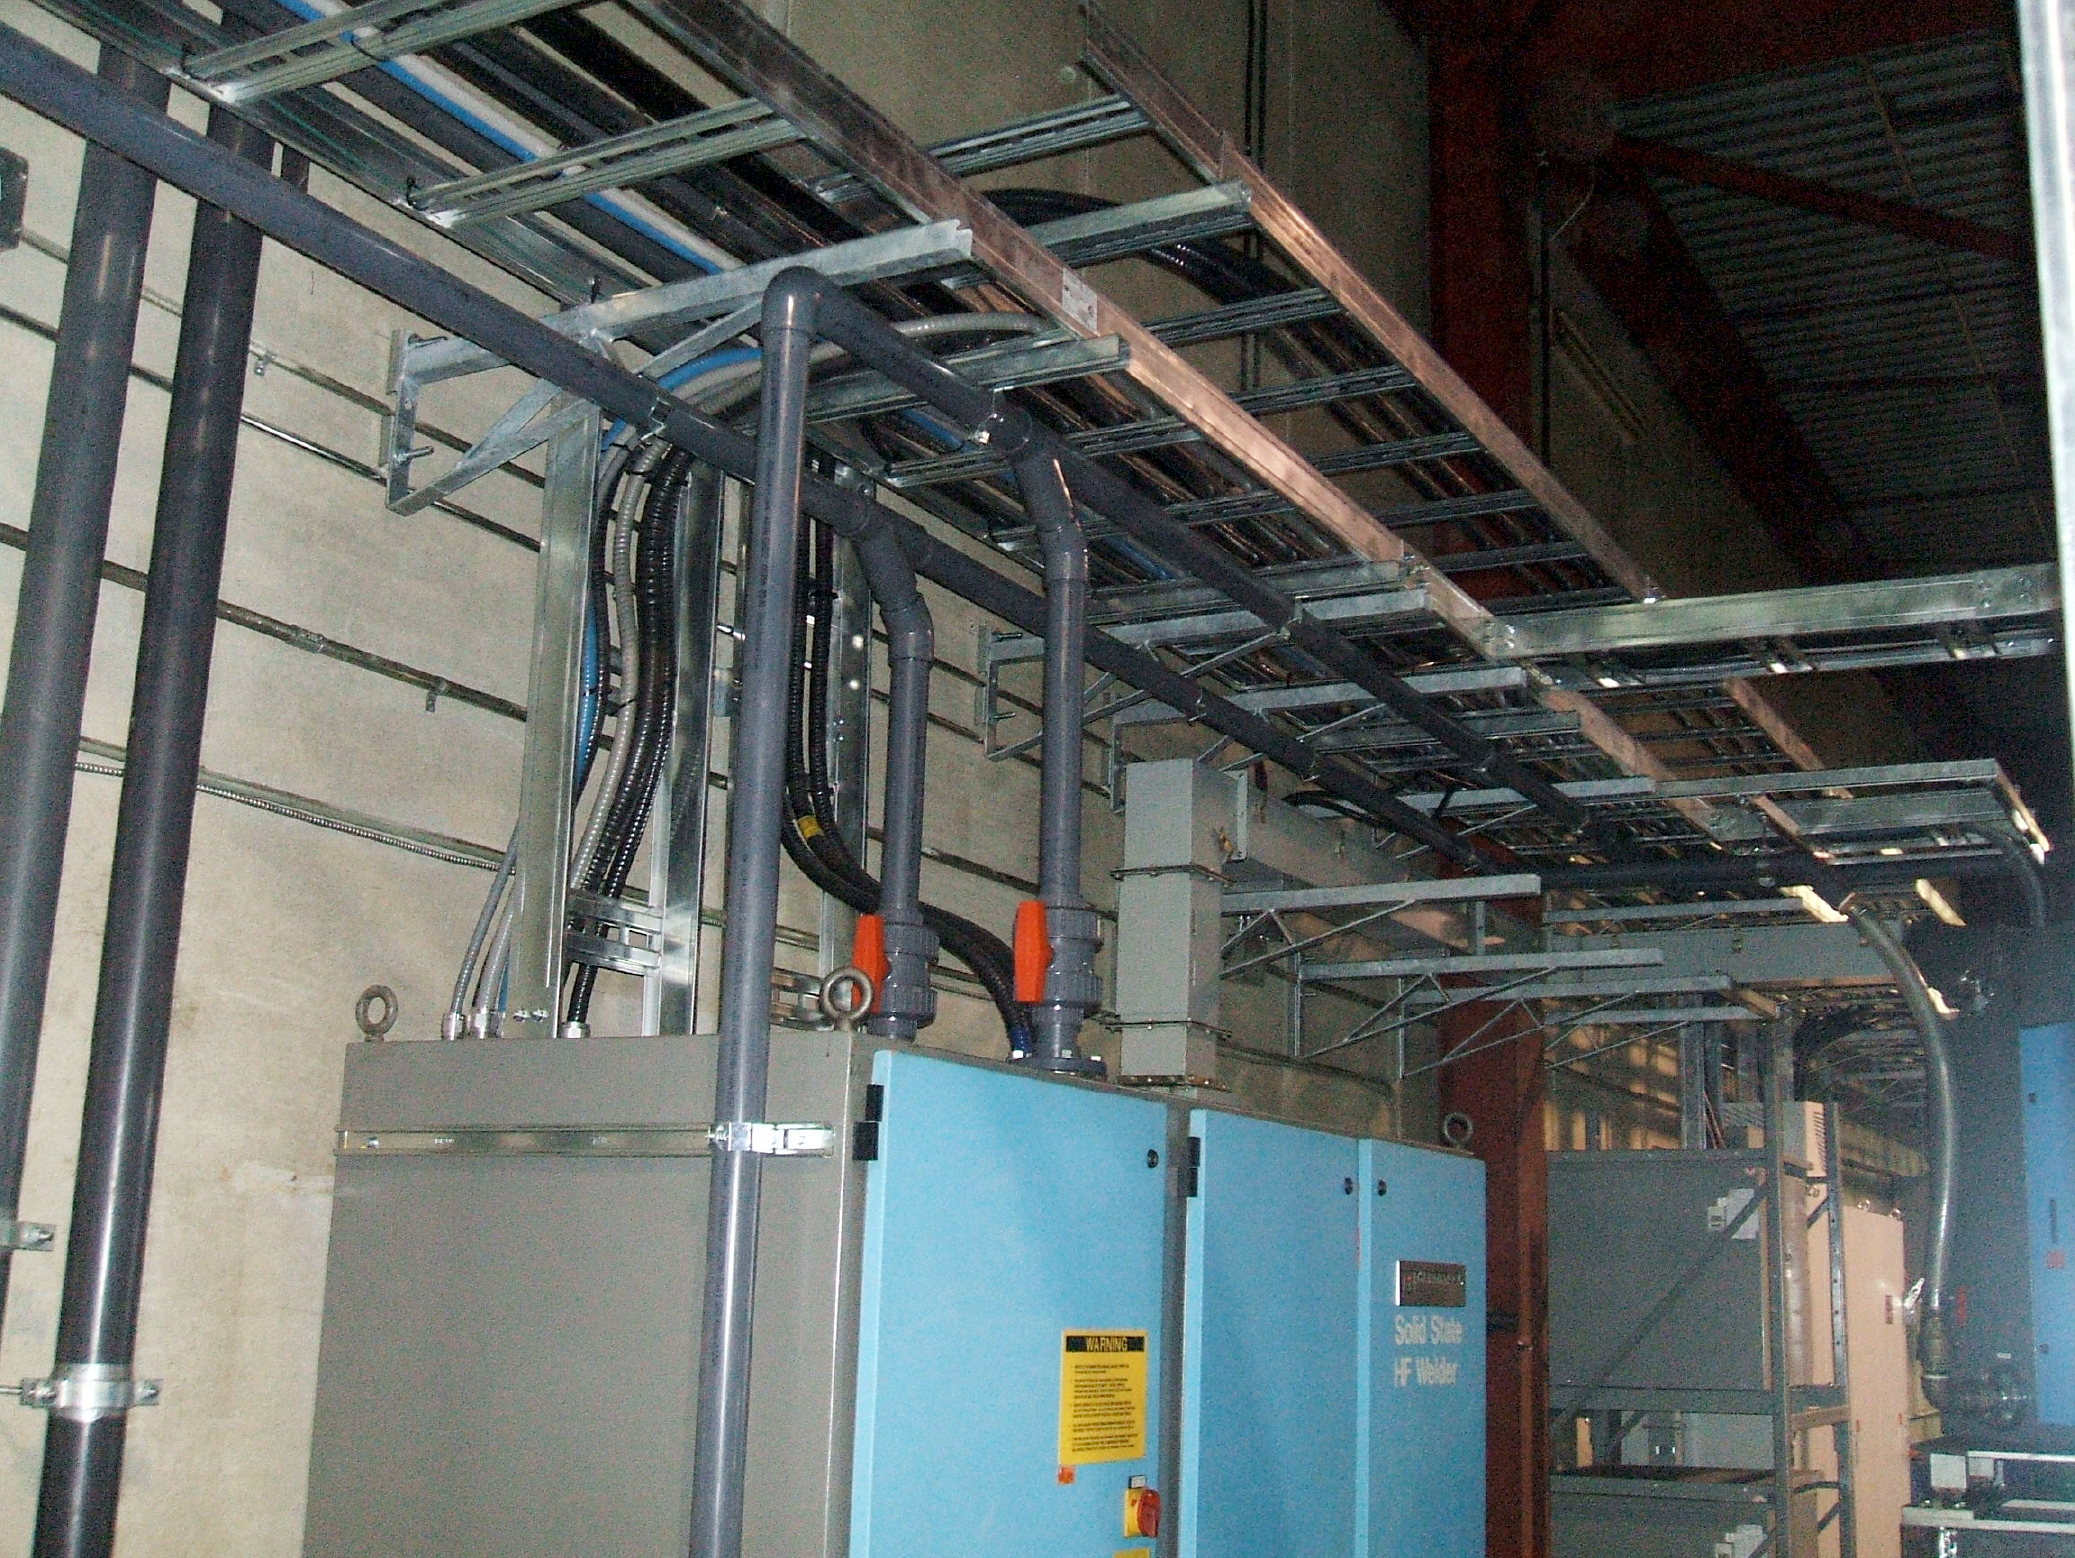 Thermatool CFI HF Welder Installation  DSCF2447